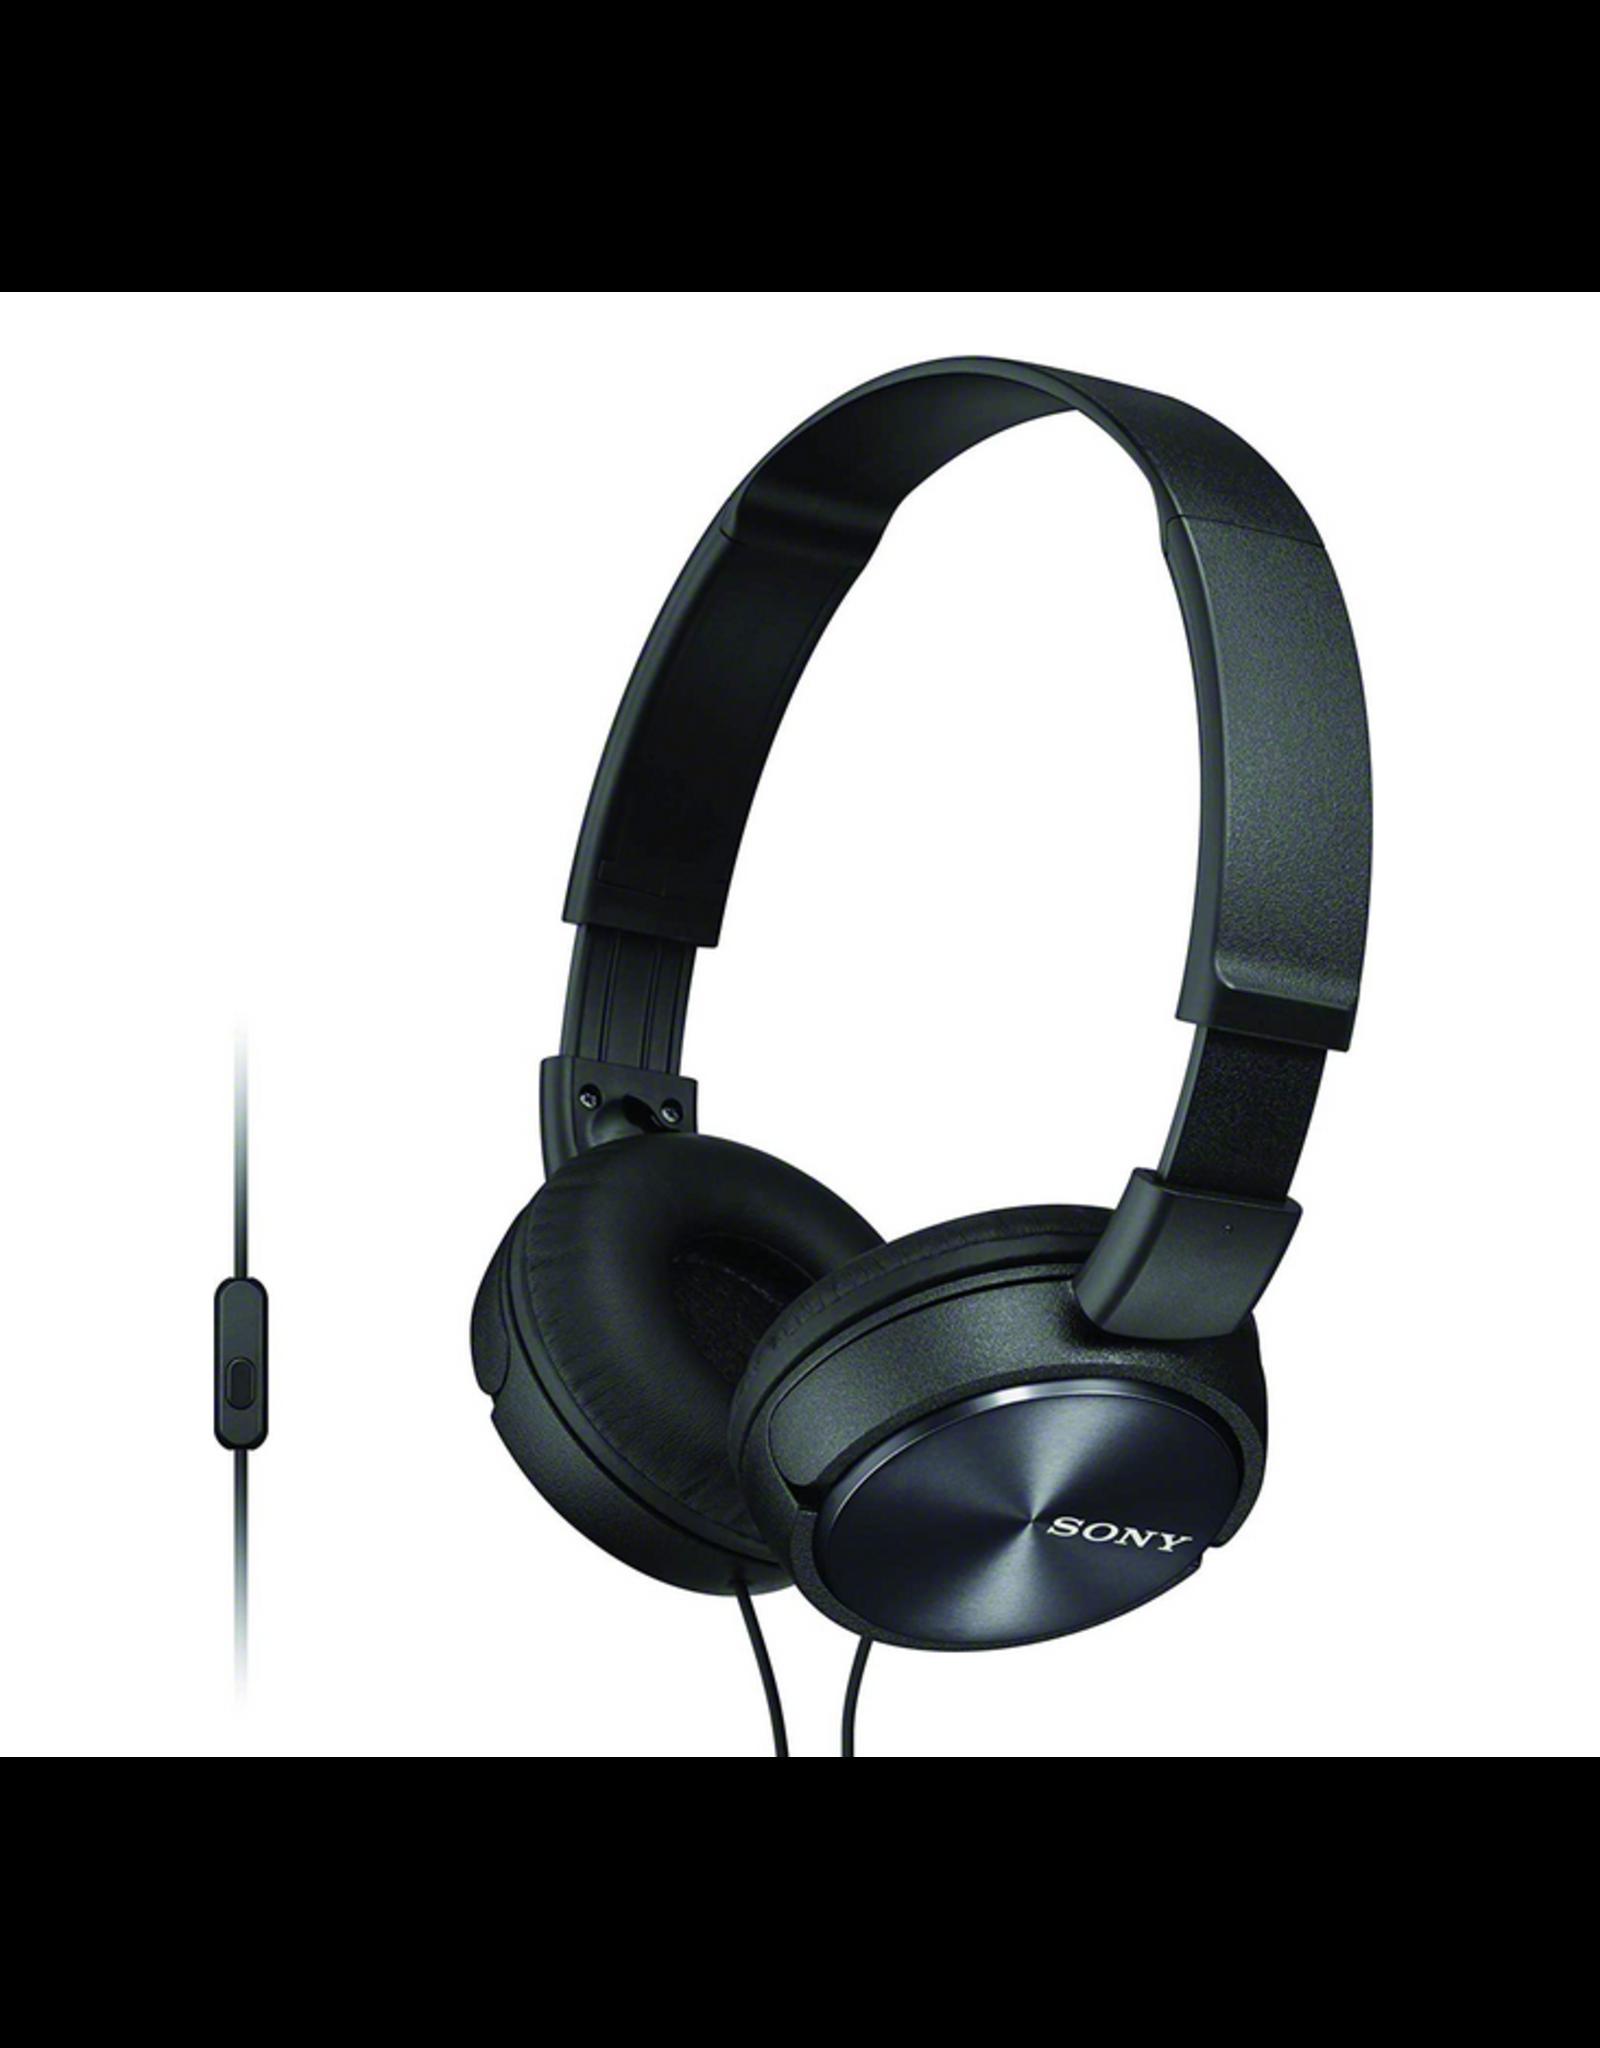 Sony Sony MDRZX310AB Headphones with Microphone Black